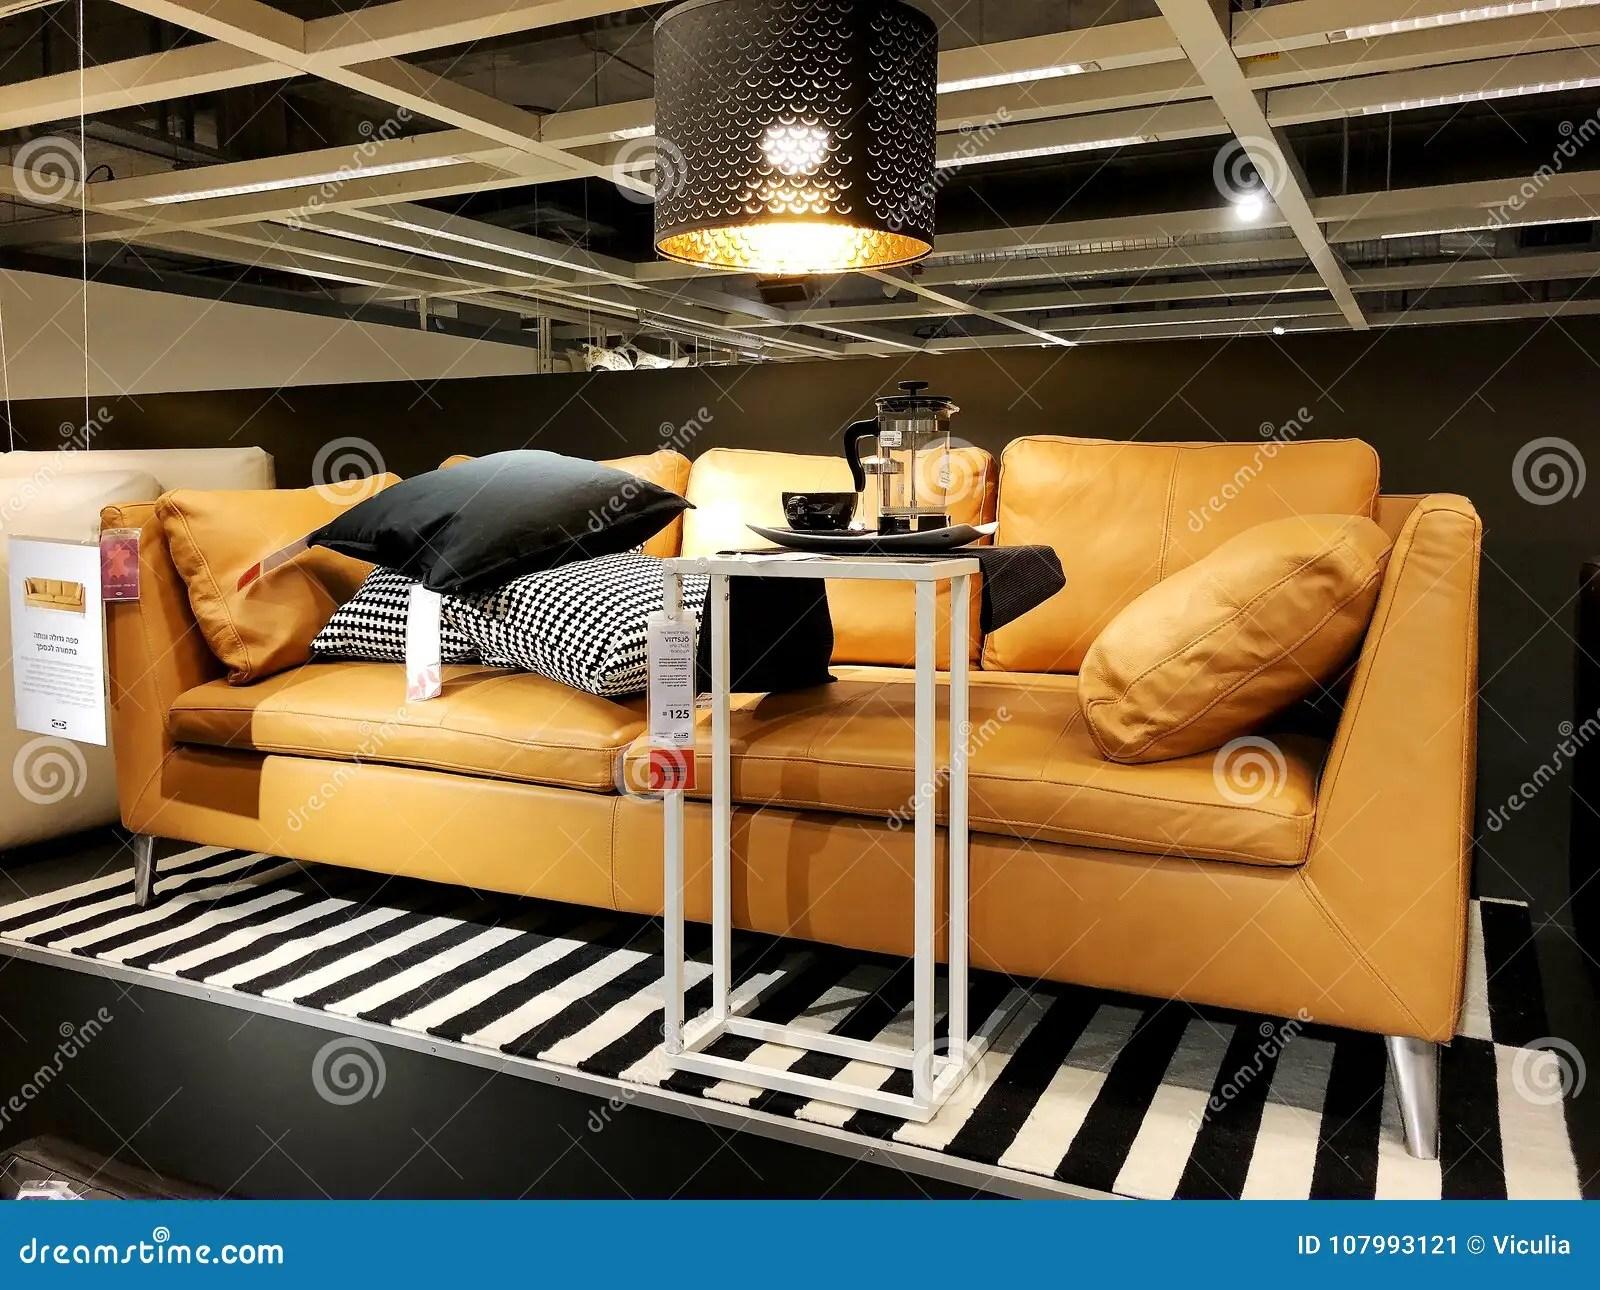 Zen Home Catalogue 2017 Ikea 2016 Catalog Bright Living Room